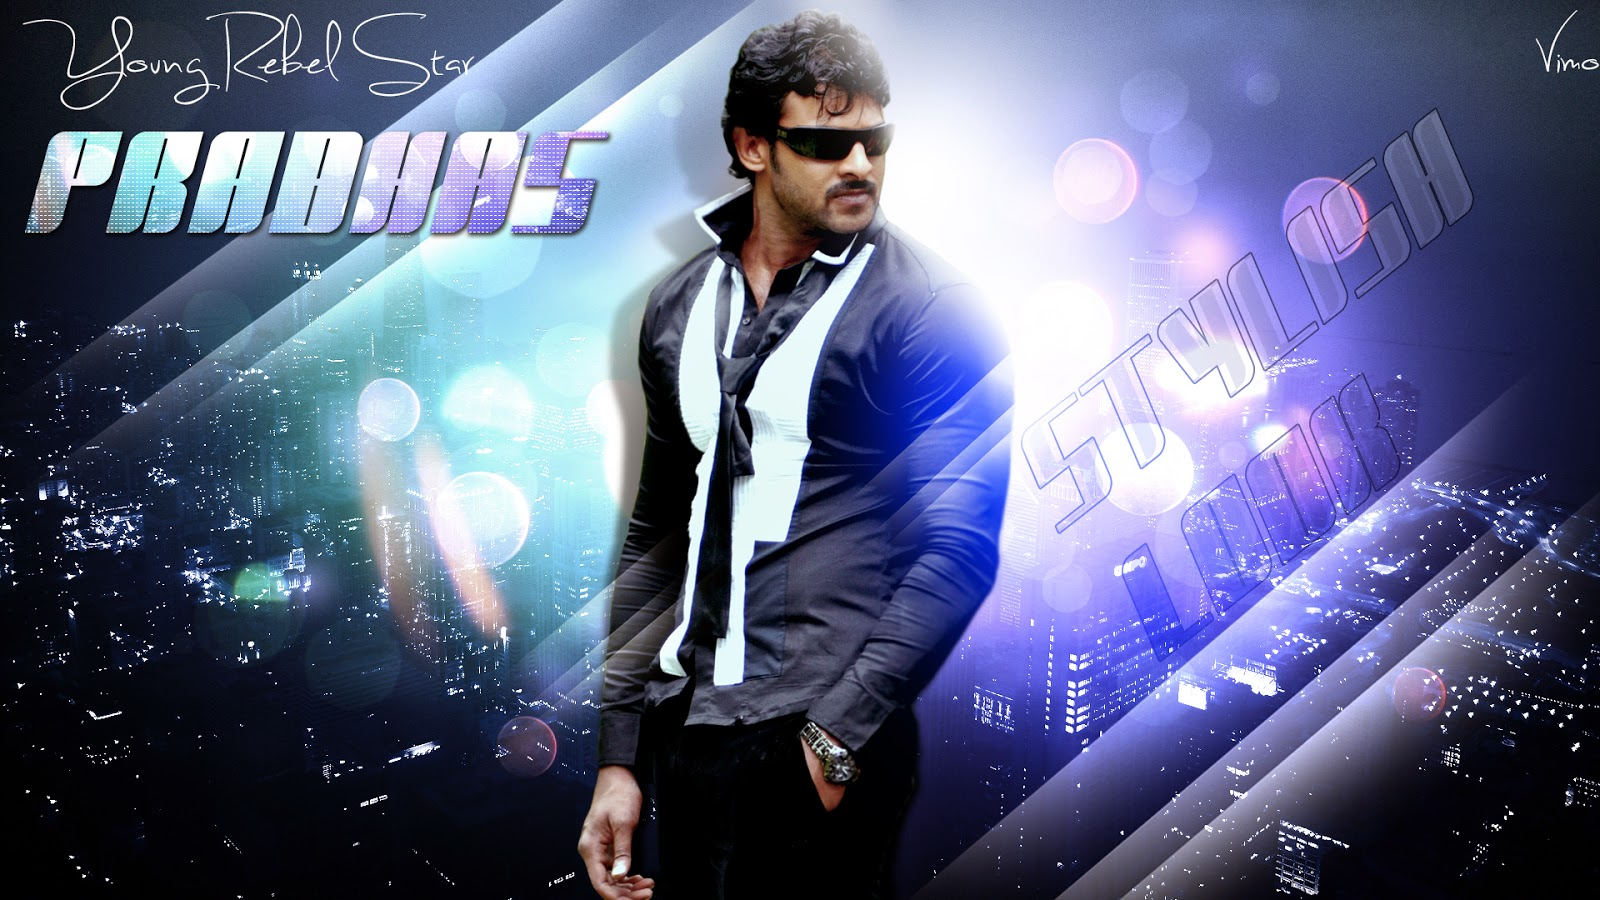 Prabhas Hd Images New: Prabhas Fans Forever